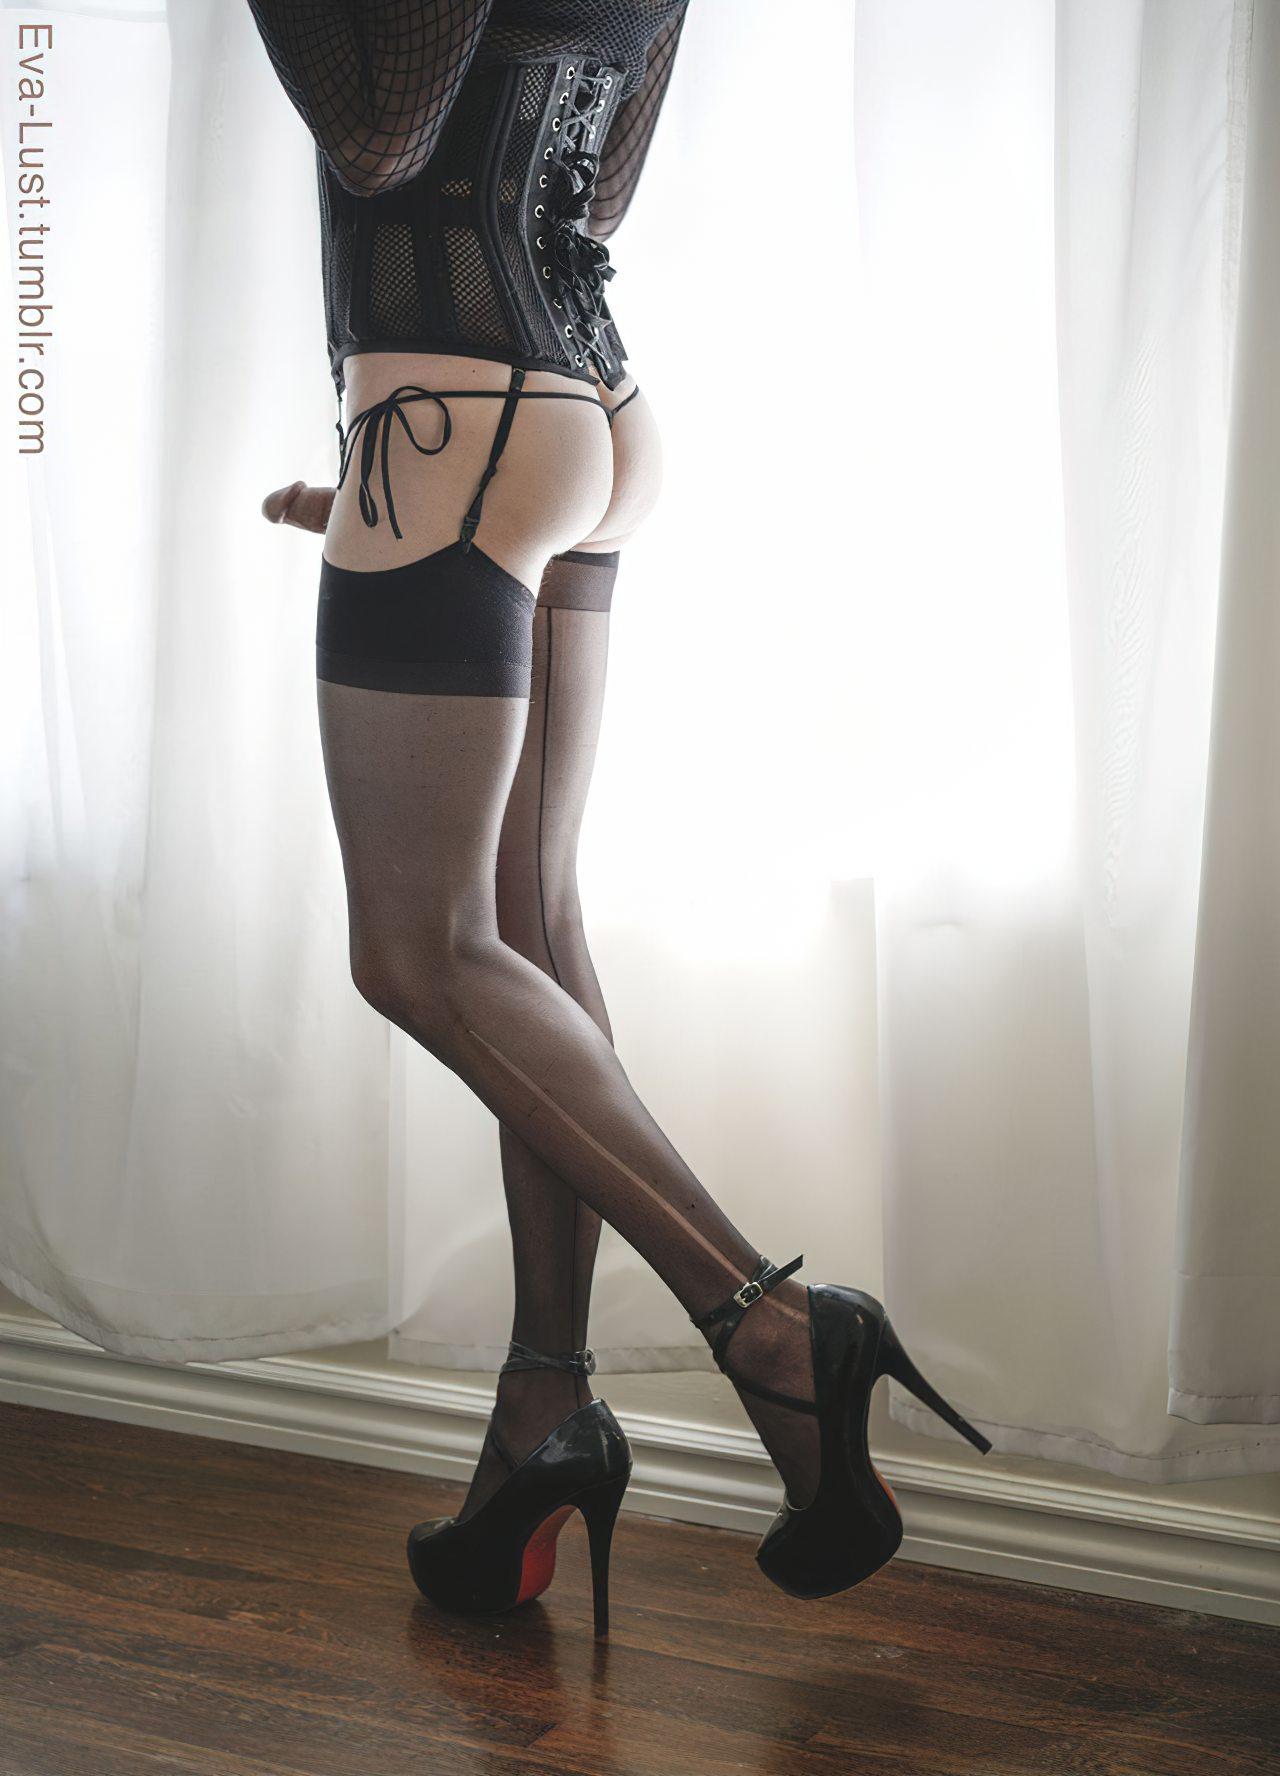 Travestis Pics (20)